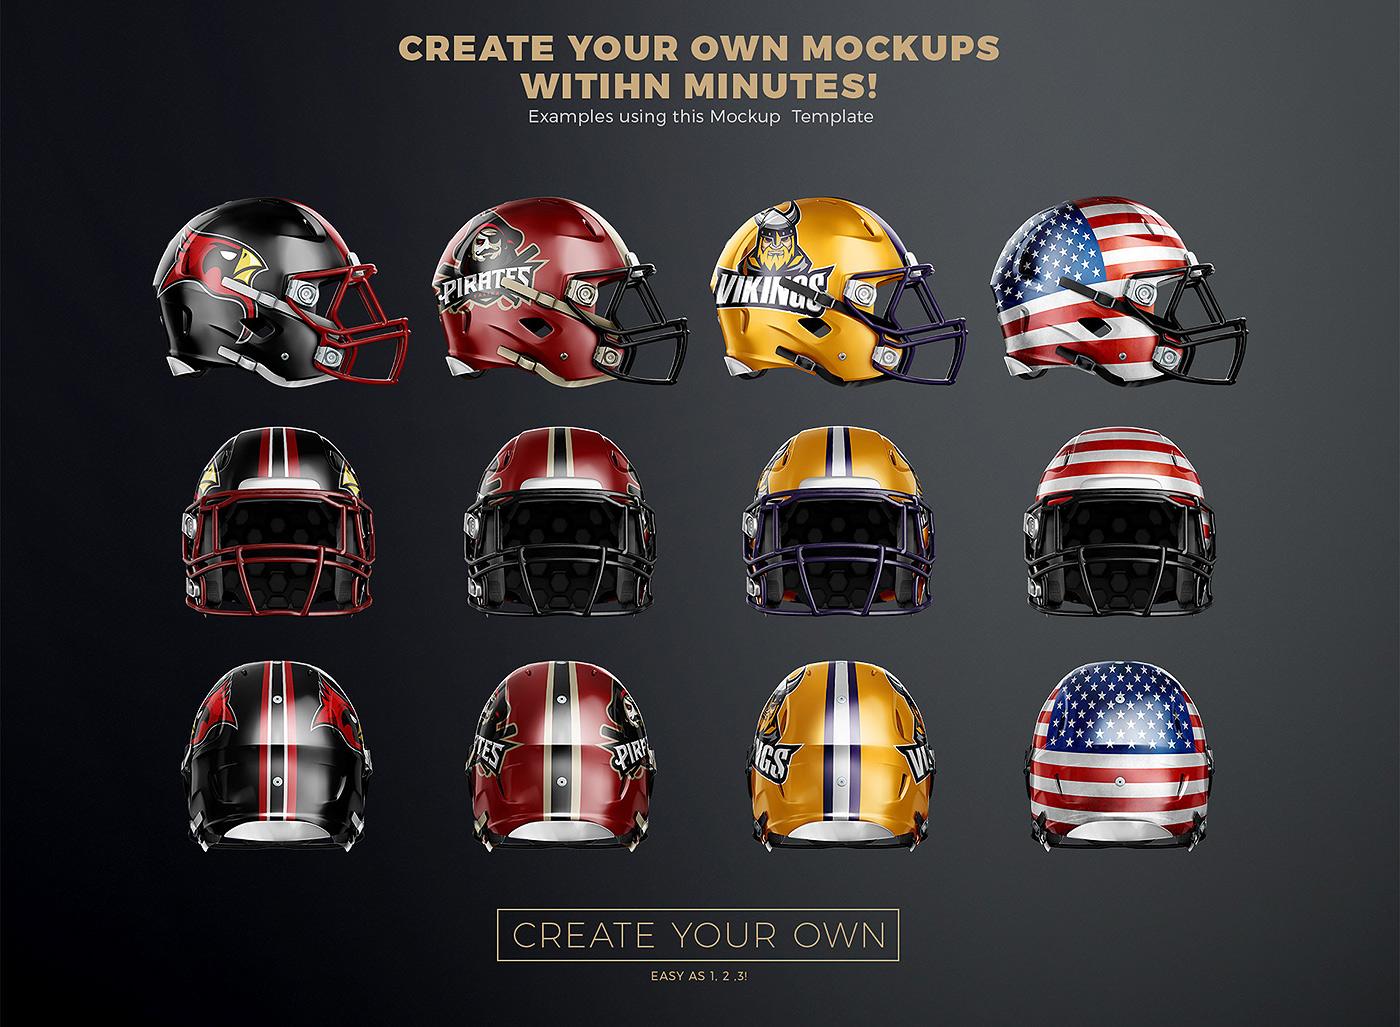 How to Make Your Own Goalie Helmet Designs  SportsRec